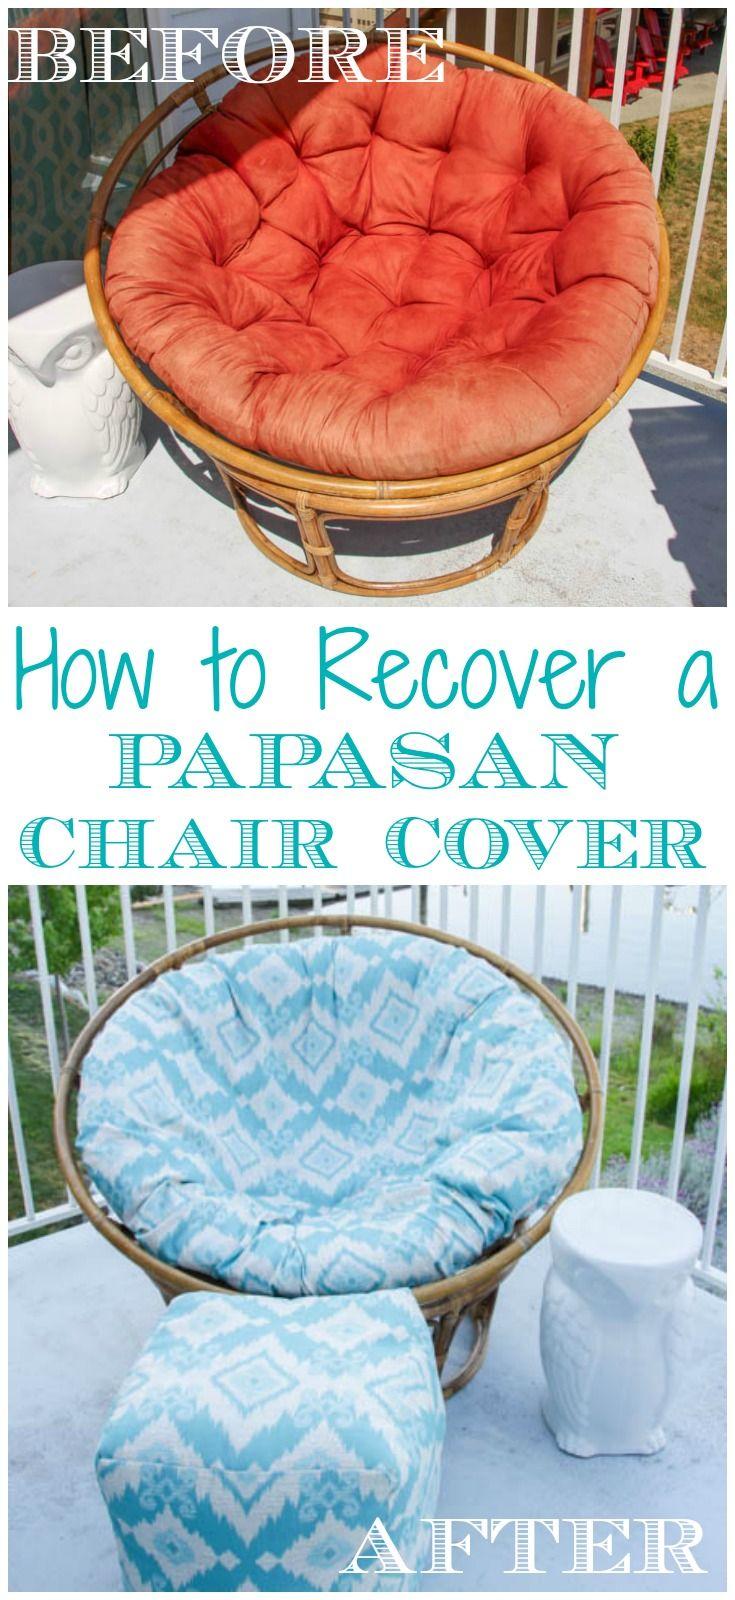 papasan chair cushion covers diy ashley and a half recliner best 25+ ideas on pinterest   pier 1 living room chairs, zen boho